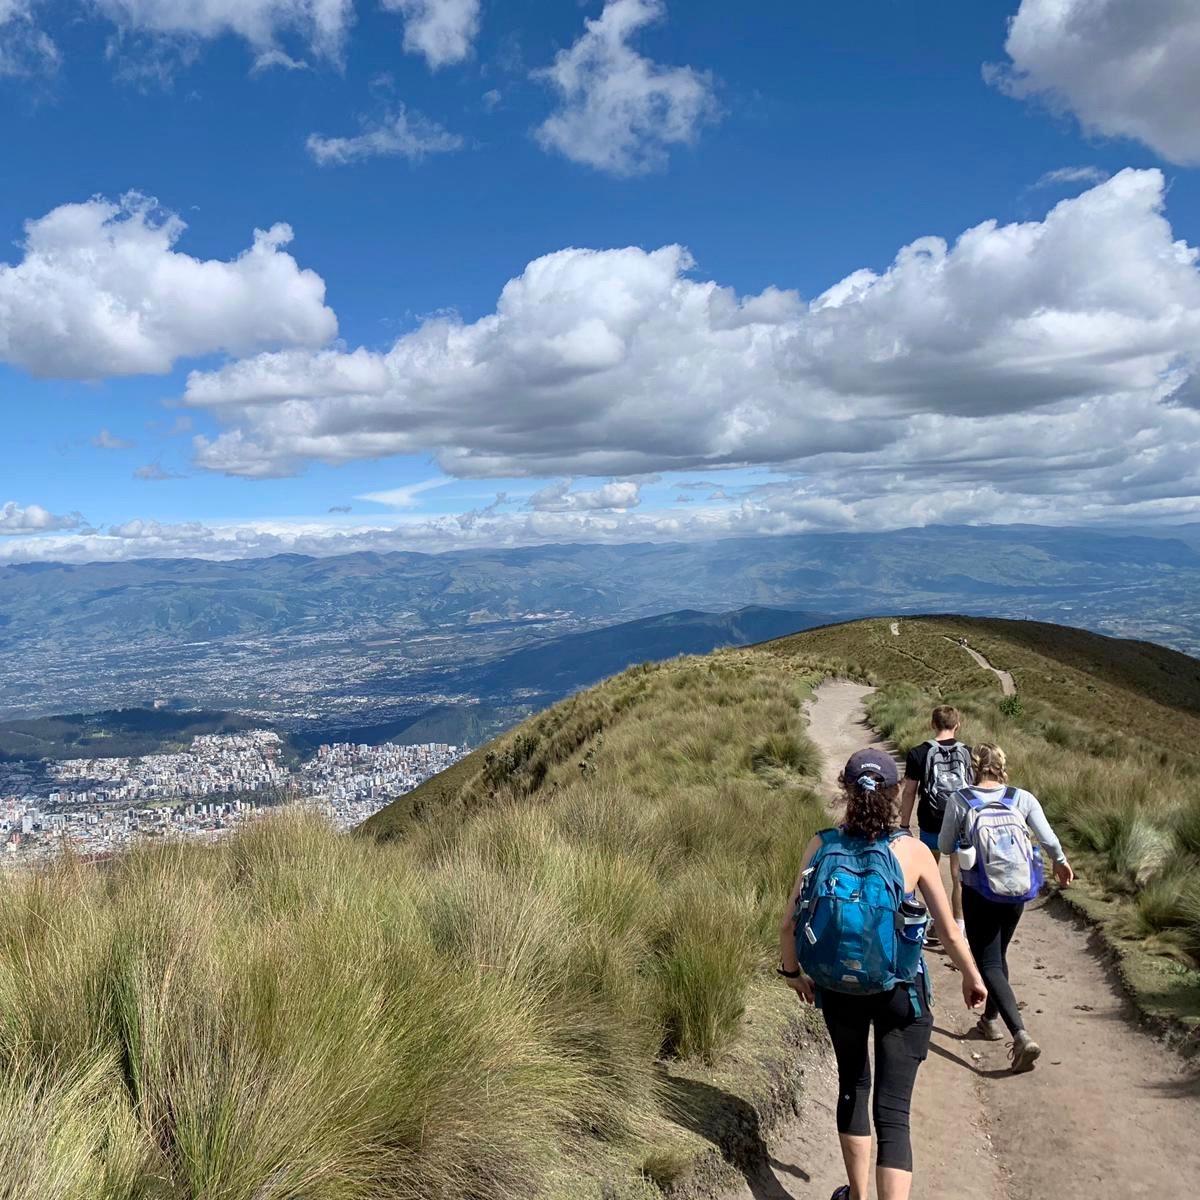 Three people hiking on a path